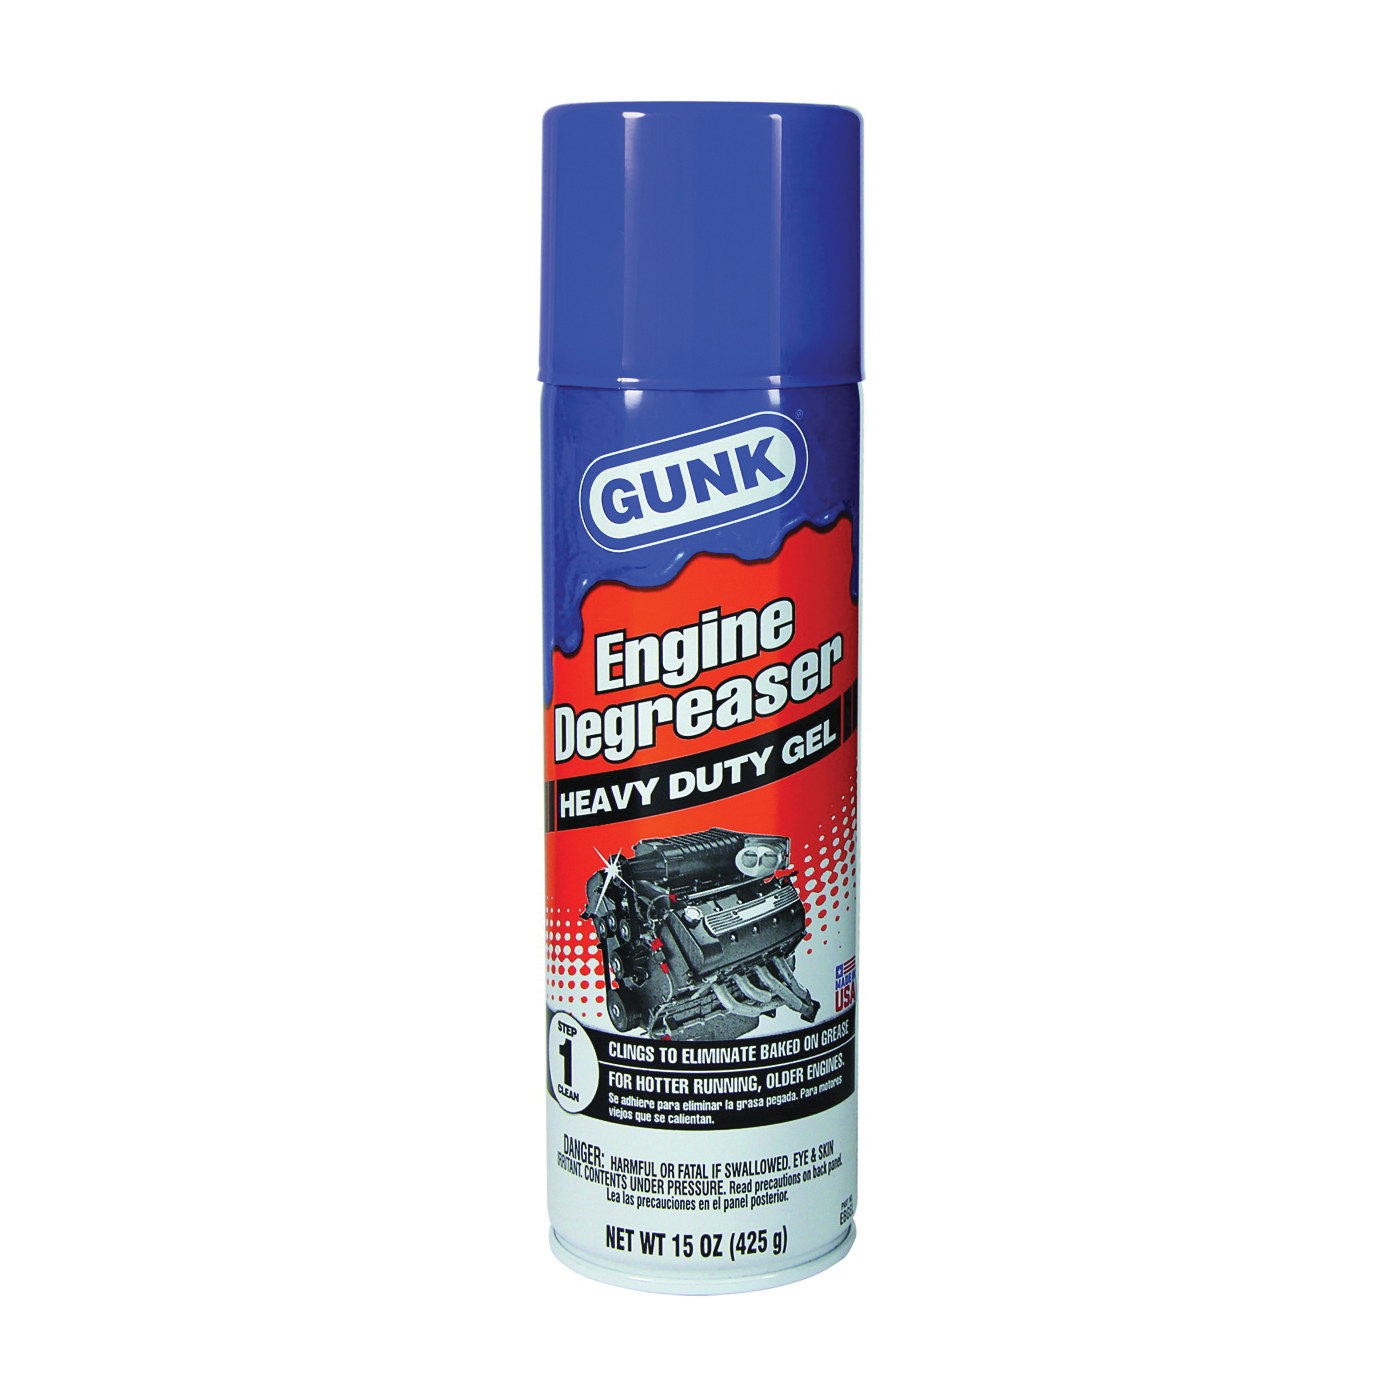 Picture of GUNK EBGEL Engine Degreaser, 15 oz Package, Aerosol Can, Liquid, Petroleum